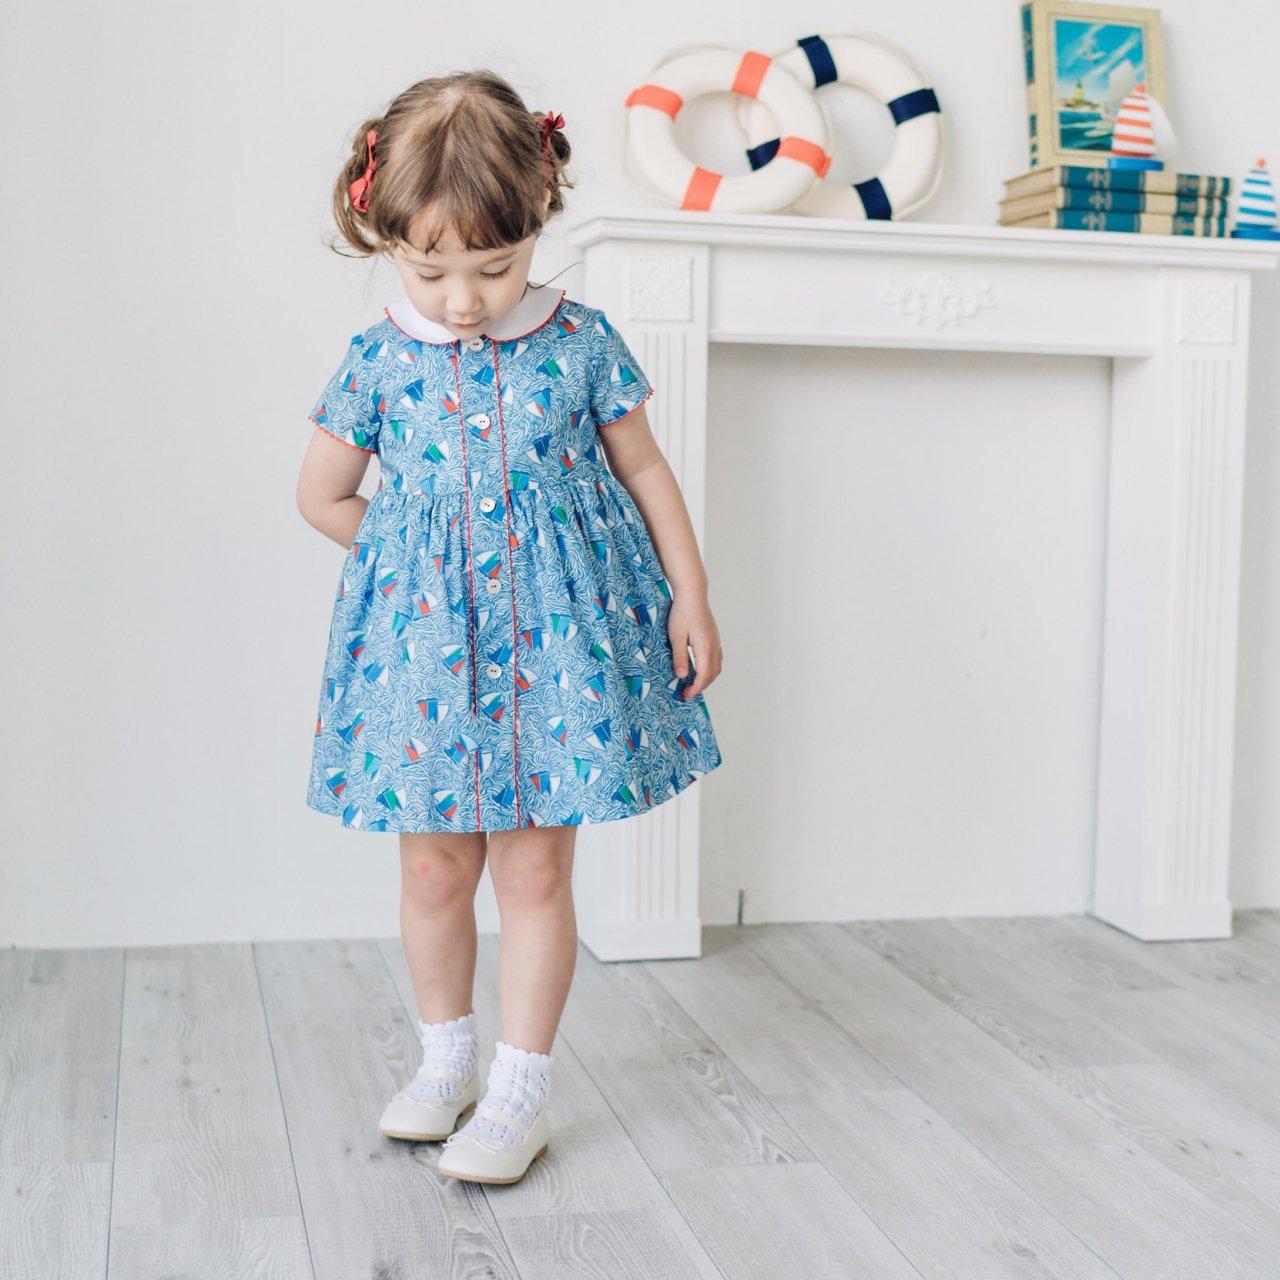 <img class='new_mark_img1' src='https://img.shop-pro.jp/img/new/icons14.gif' style='border:none;display:inline;margin:0px;padding:0px;width:auto;' />Amaia Kids - Carole dress (Liberty)